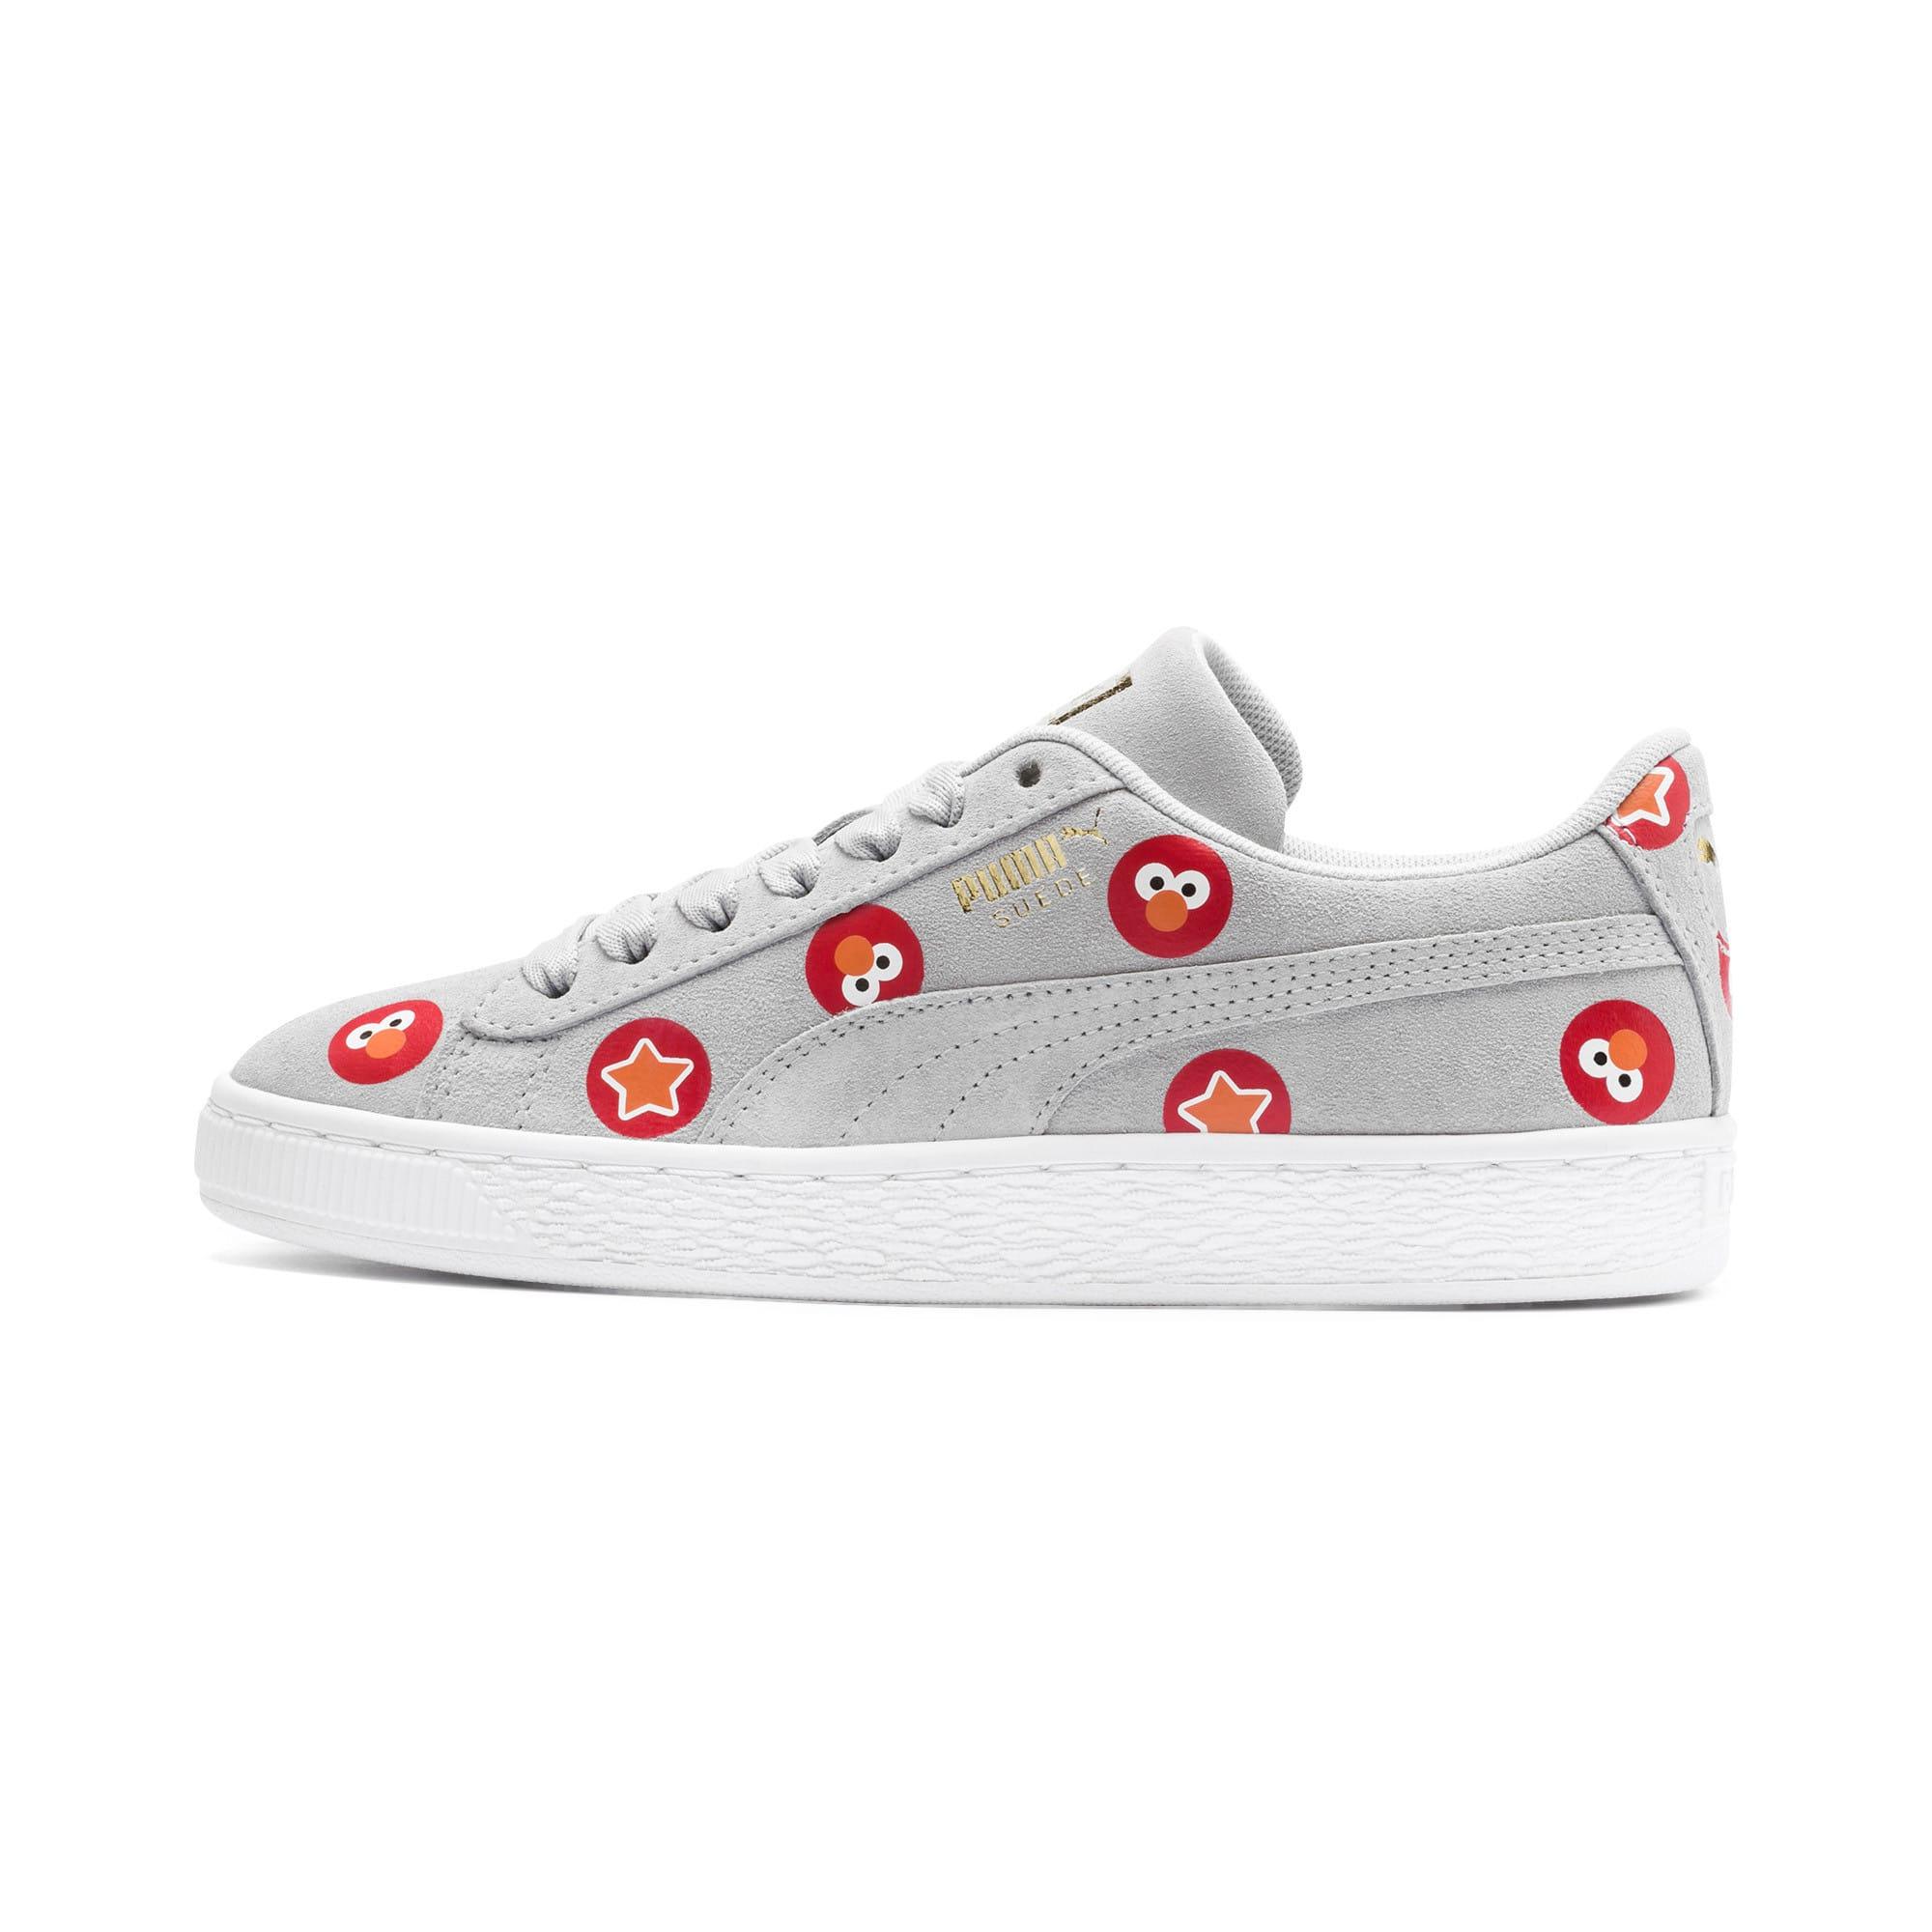 Thumbnail 1 of PUMA x SESAME STREET 50 Suede Badge Sneakers JR, Grey Dawn-High Risk Red, medium